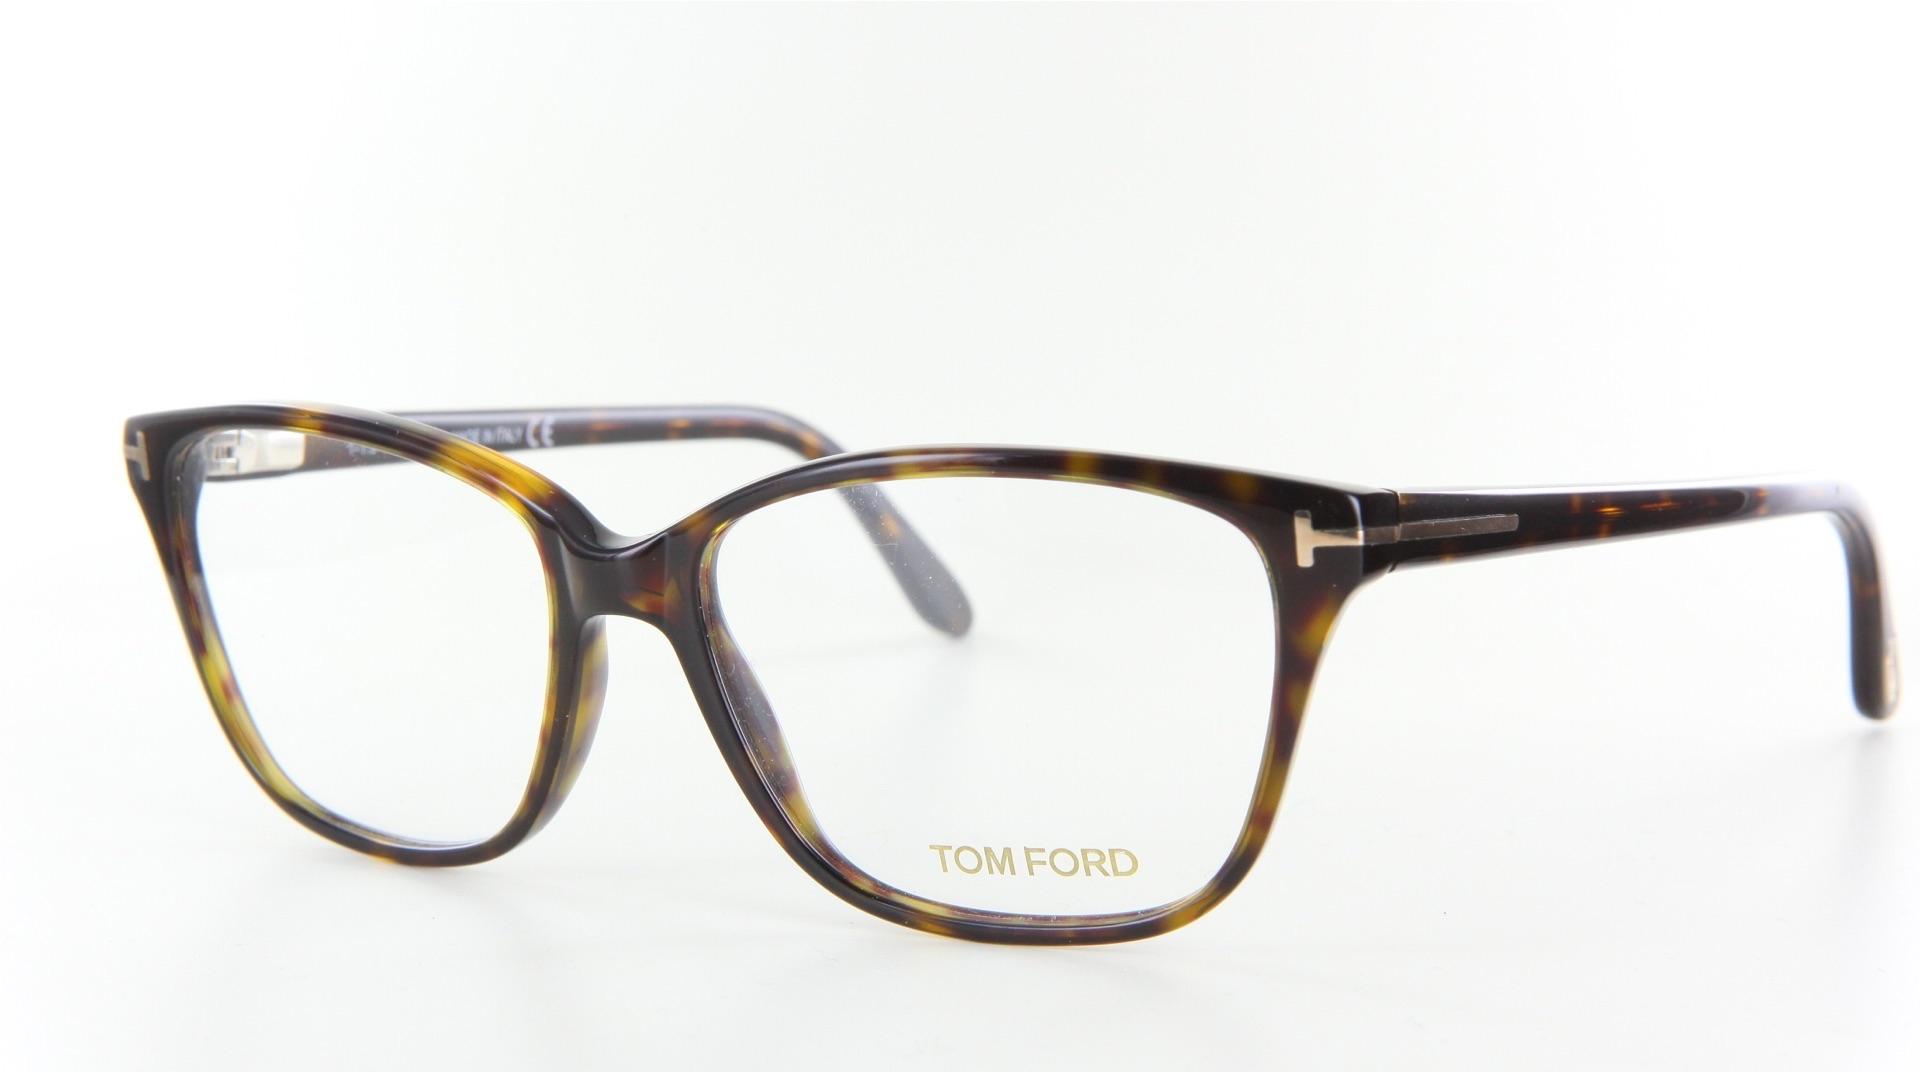 Tom Ford - ref: 70754